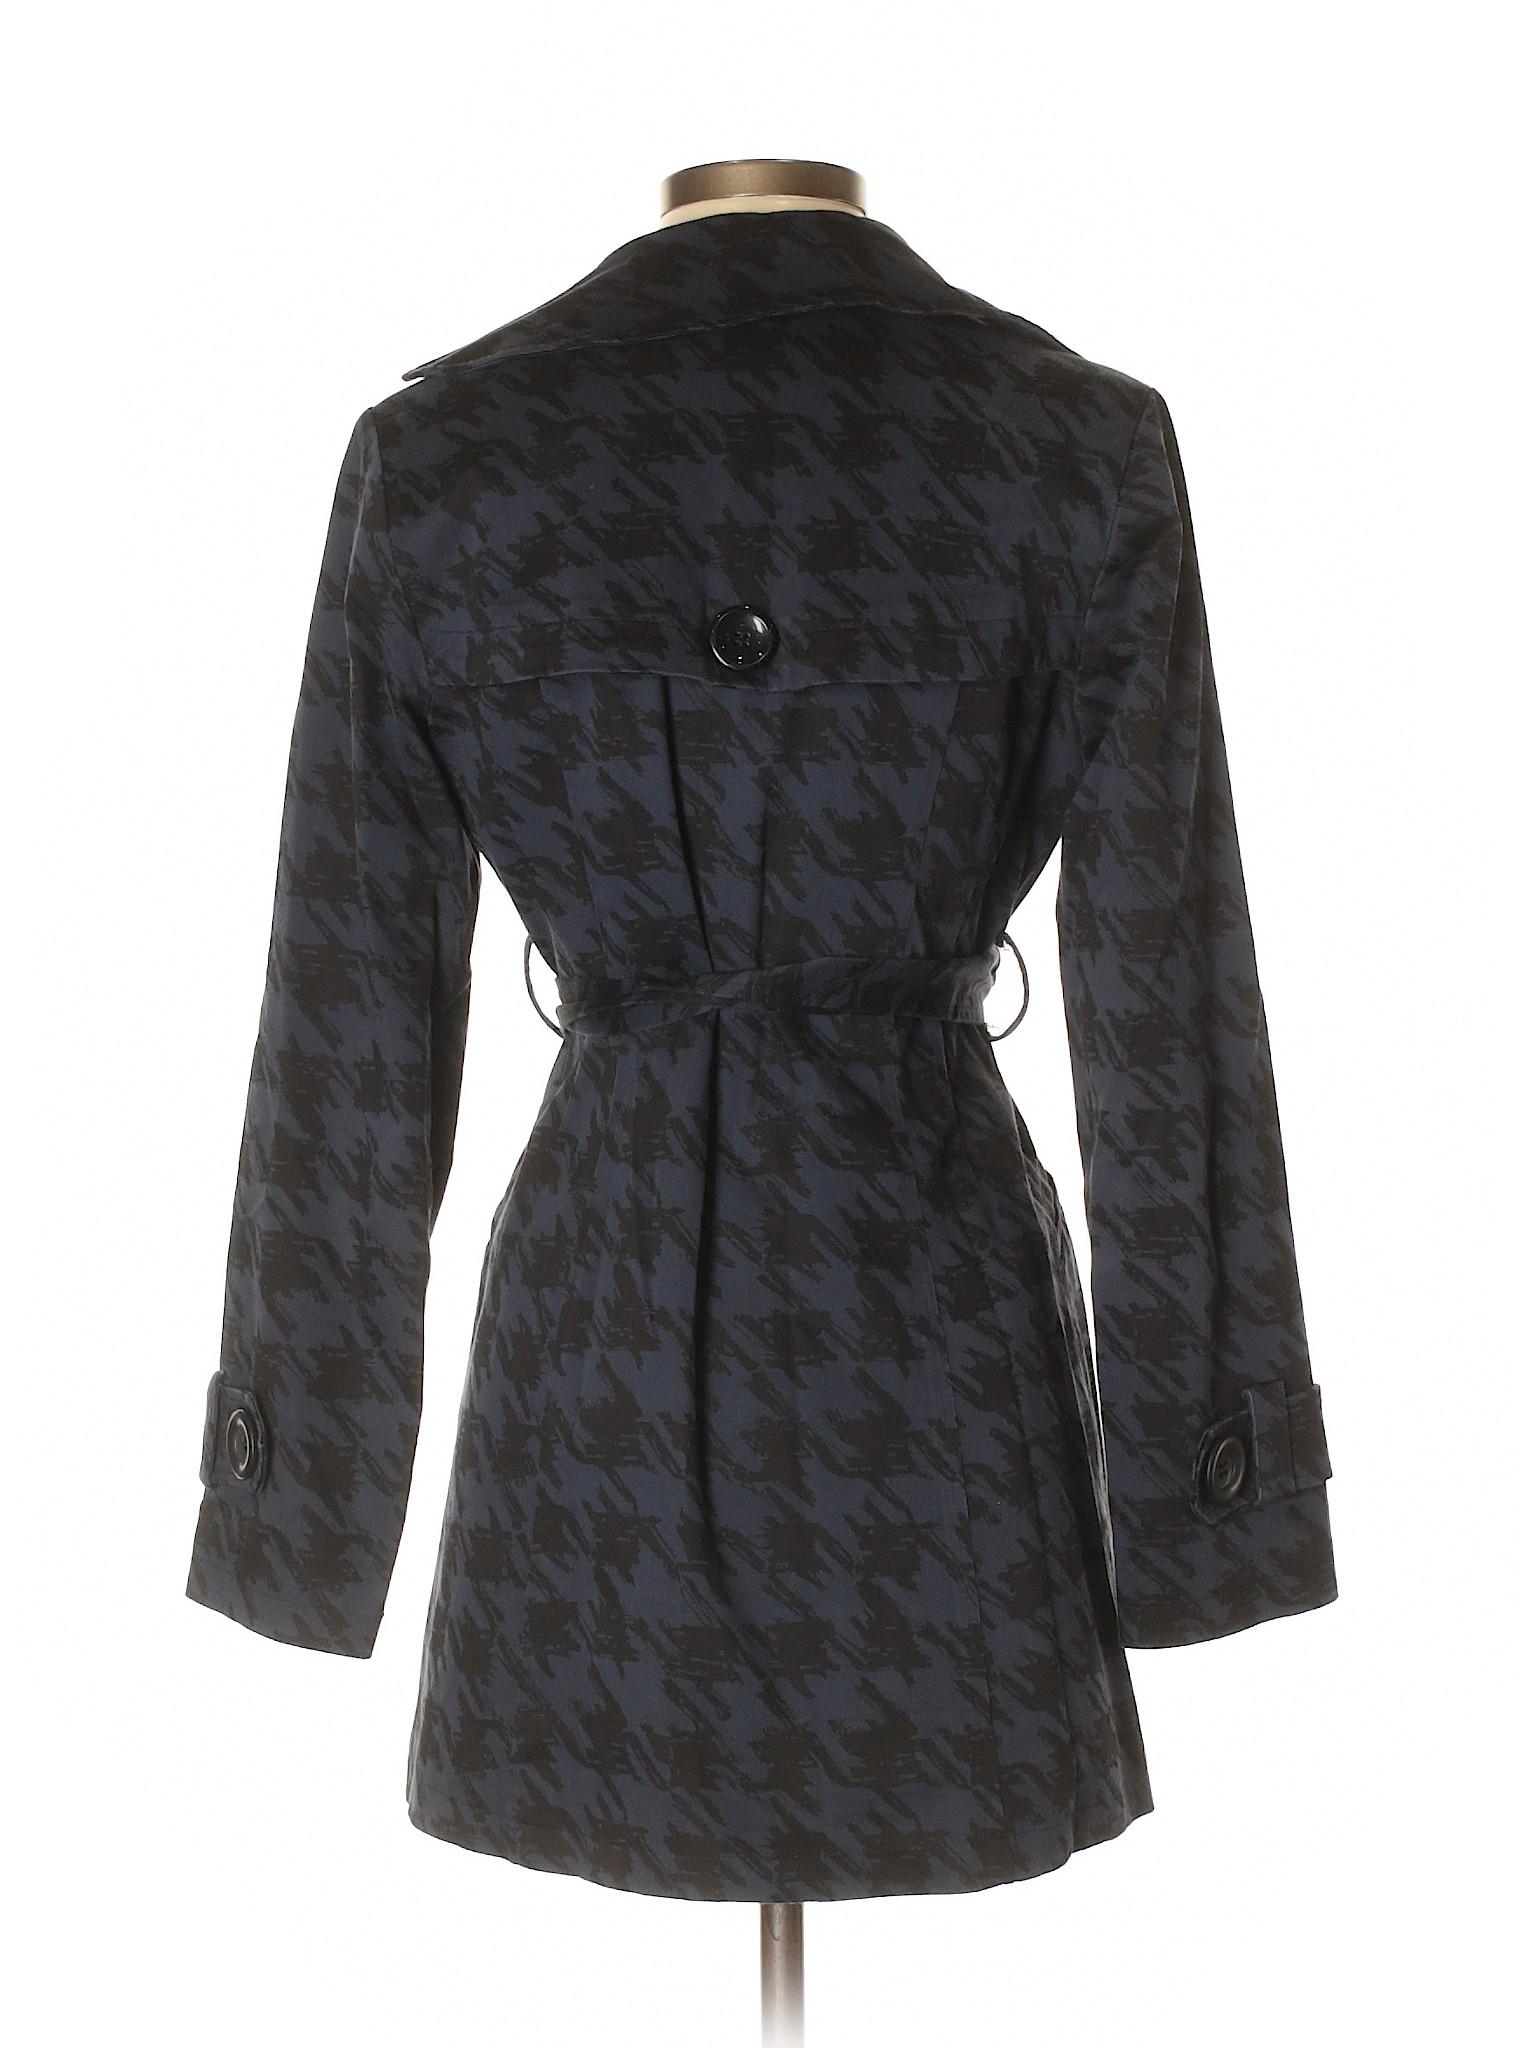 Boutique XXI Boutique Coat Coat winter Coat winter Boutique Boutique XXI winter XXI gArtxqwgO